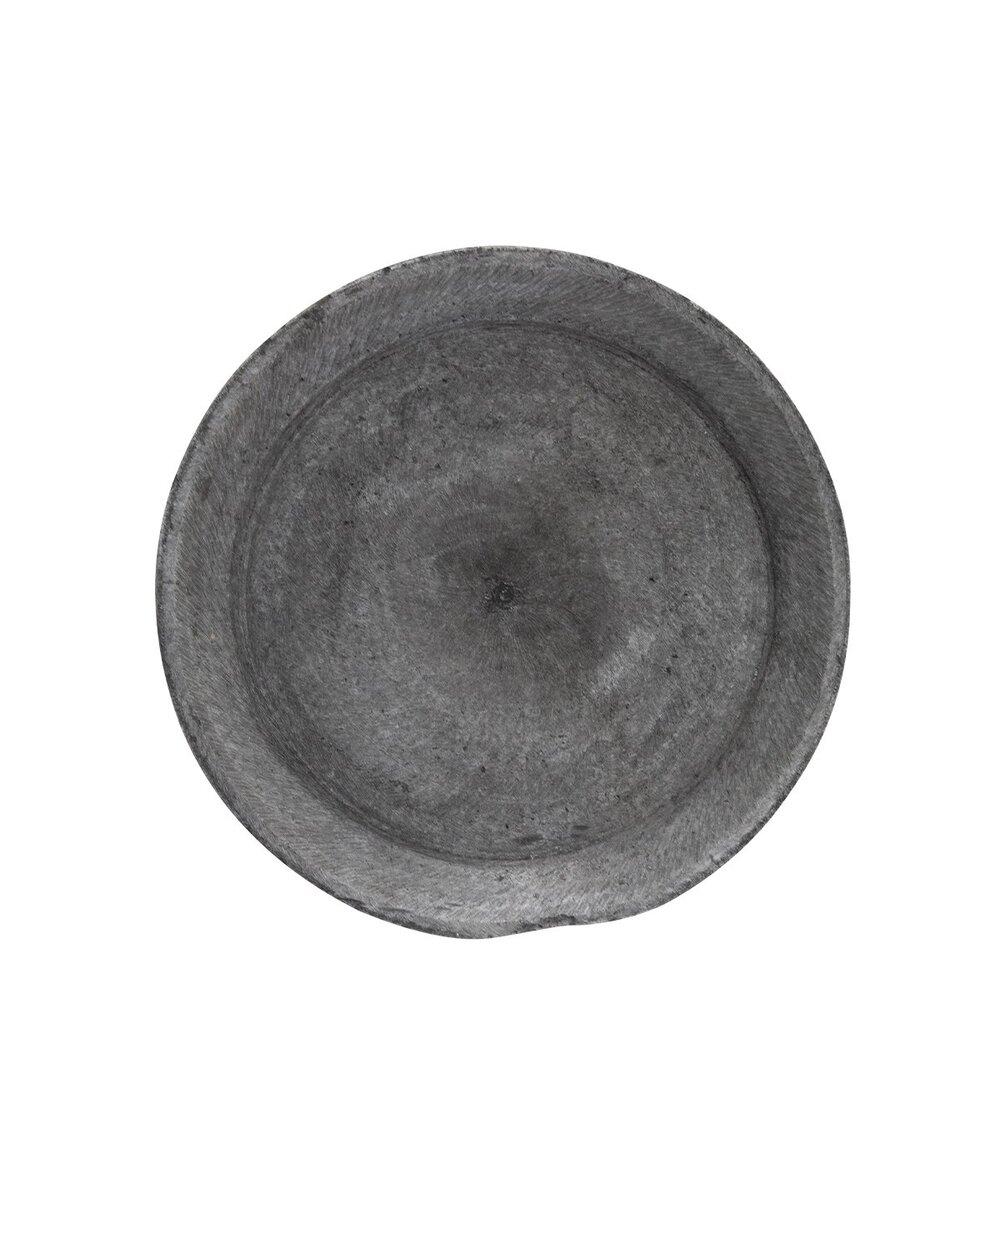 Circle_Stone_Tray01.jpg